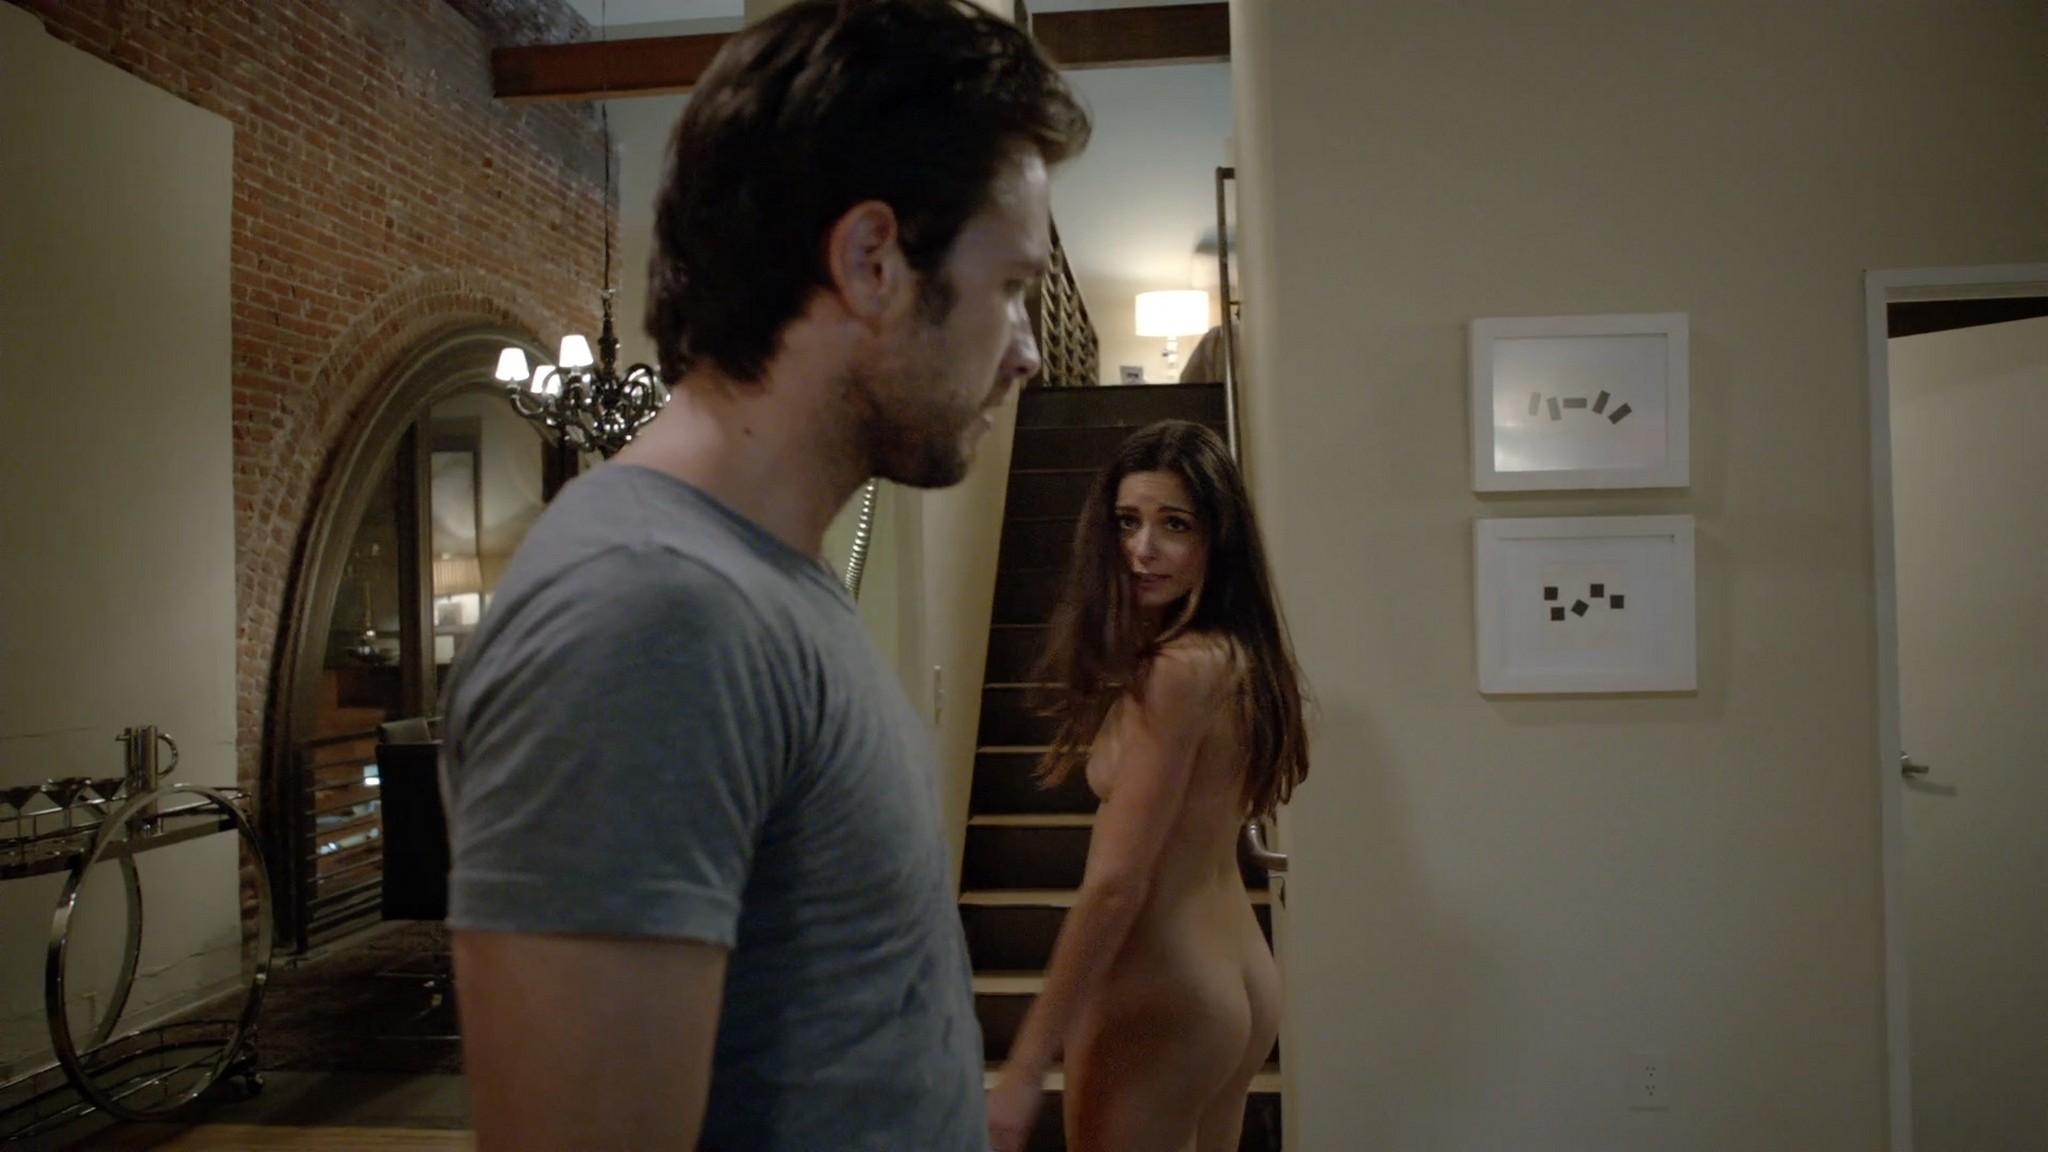 Stephanie Fantauzzi butt naked and topless - Shameless s3e7 (2013) HD 1080p (3)